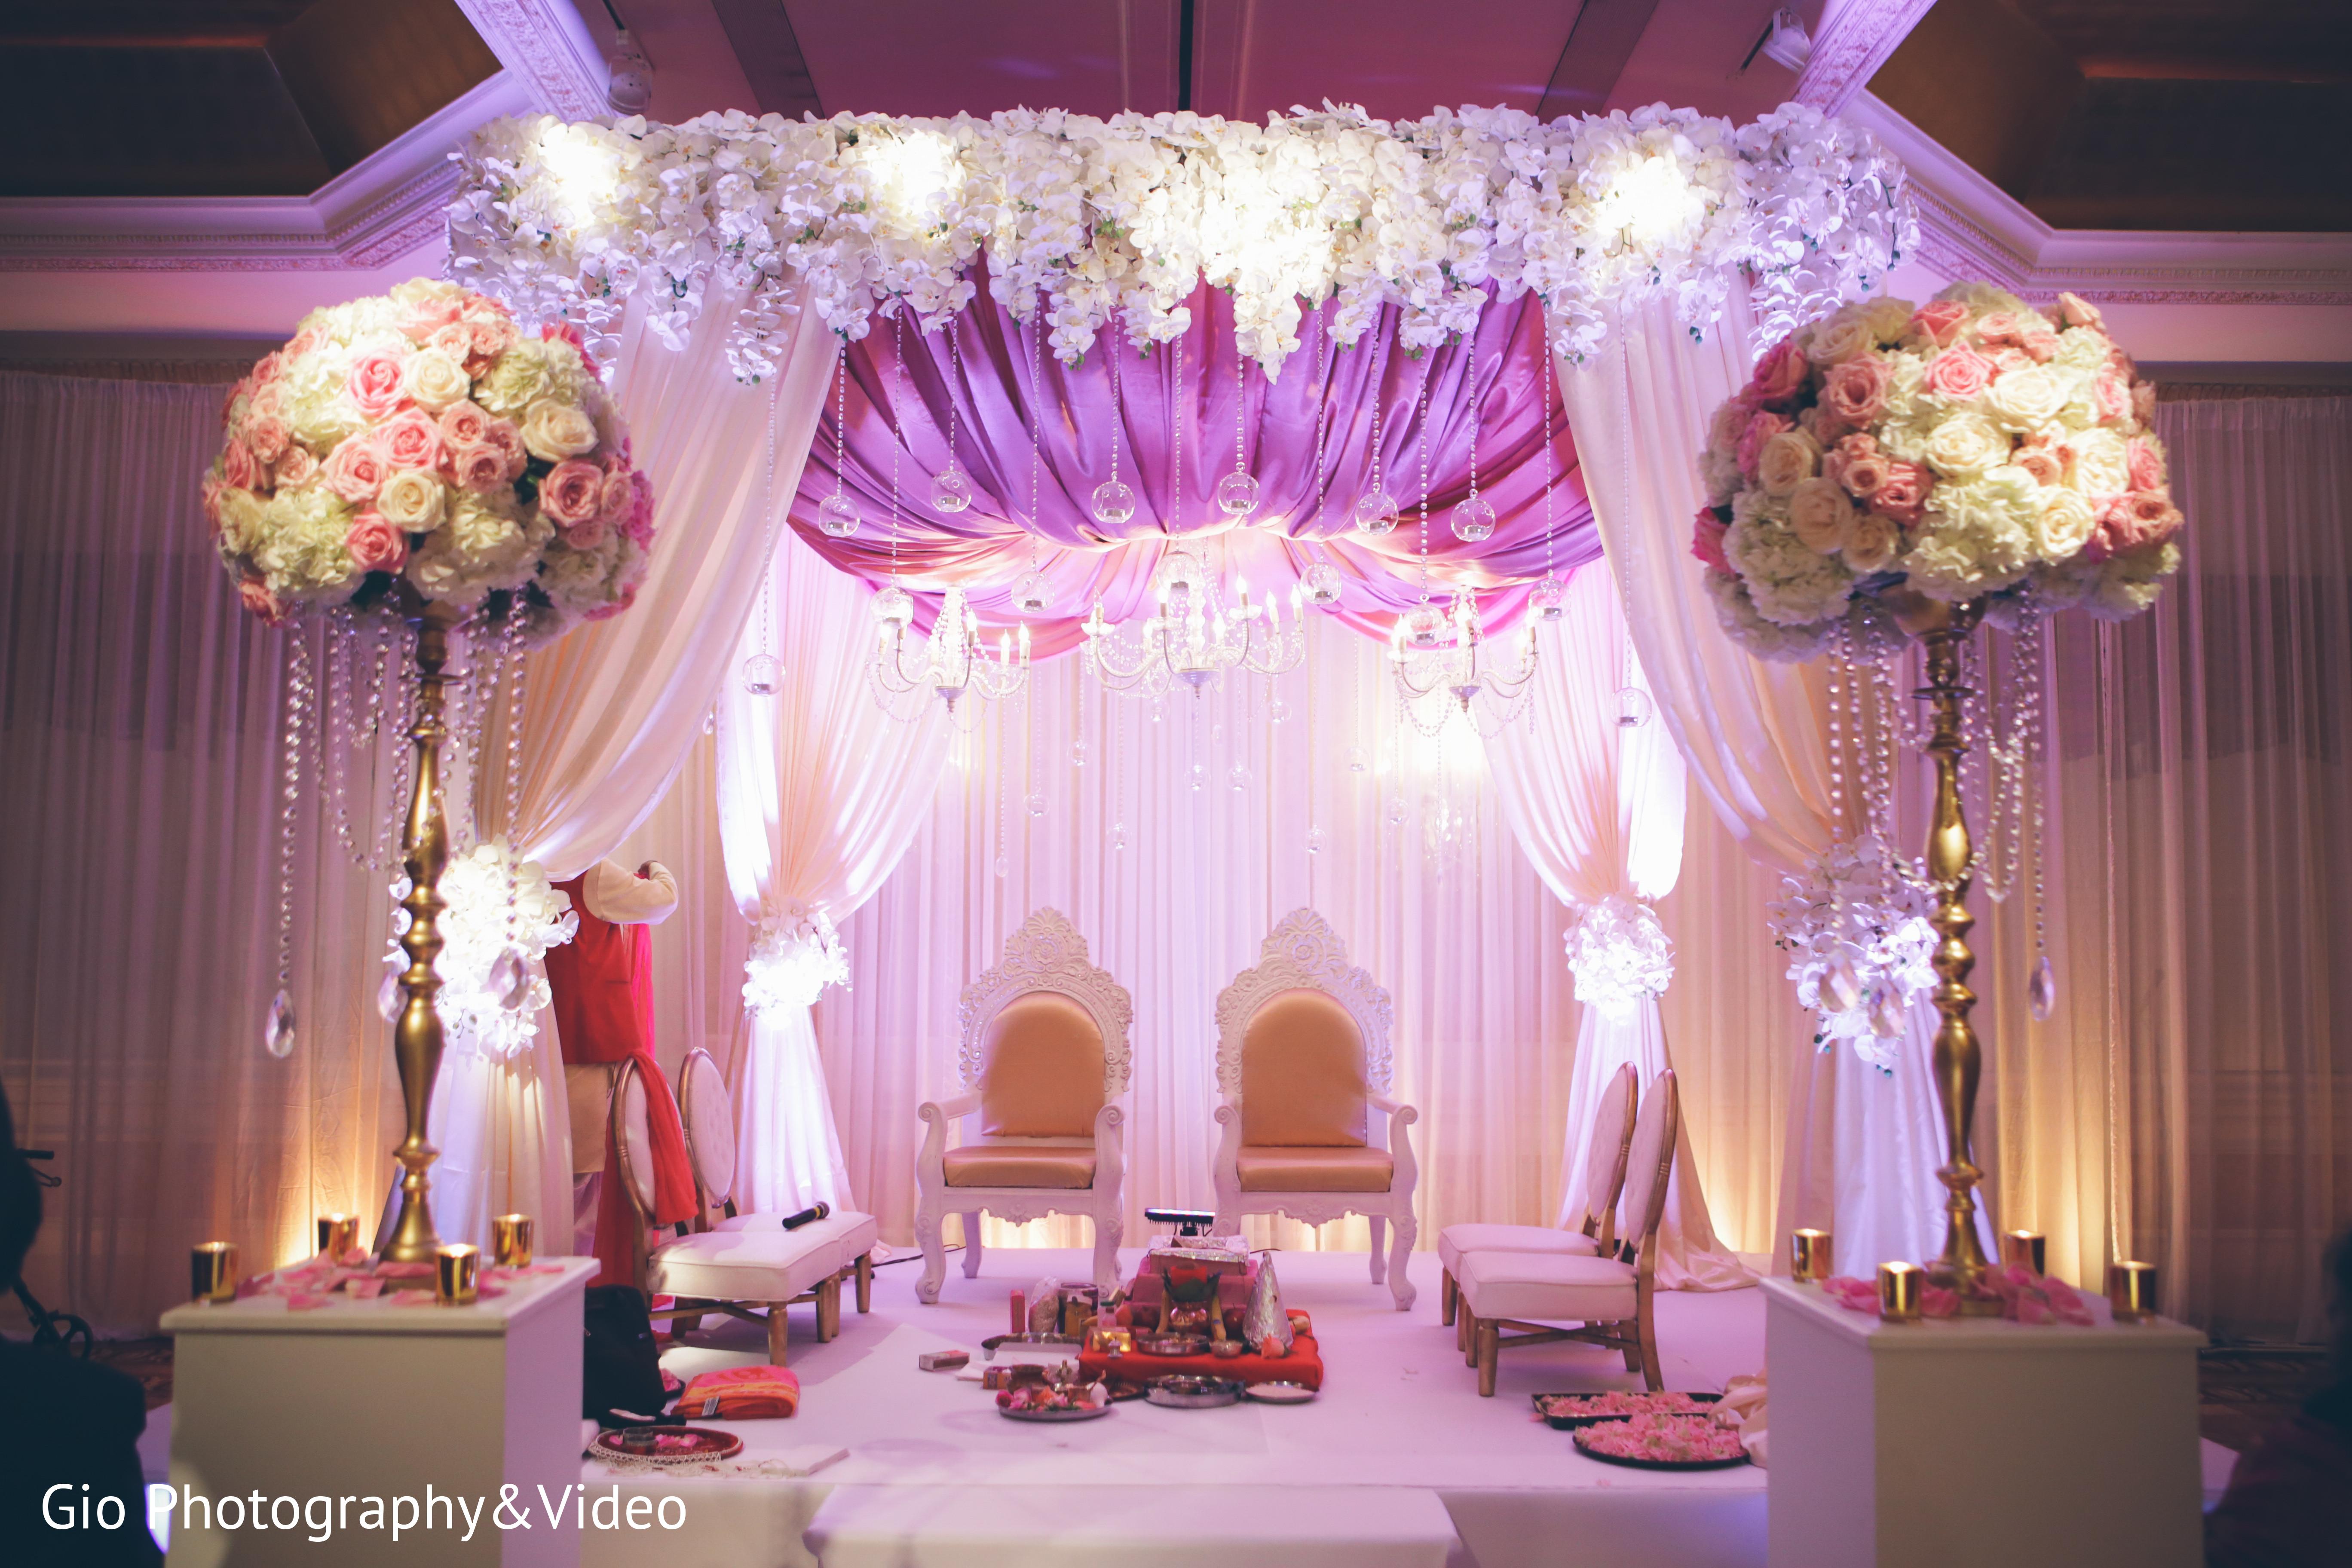 Ceremony in garden city ny indian wedding by gio photography ceremony in garden city ny indian wedding by gio photography video maharani weddings junglespirit Gallery